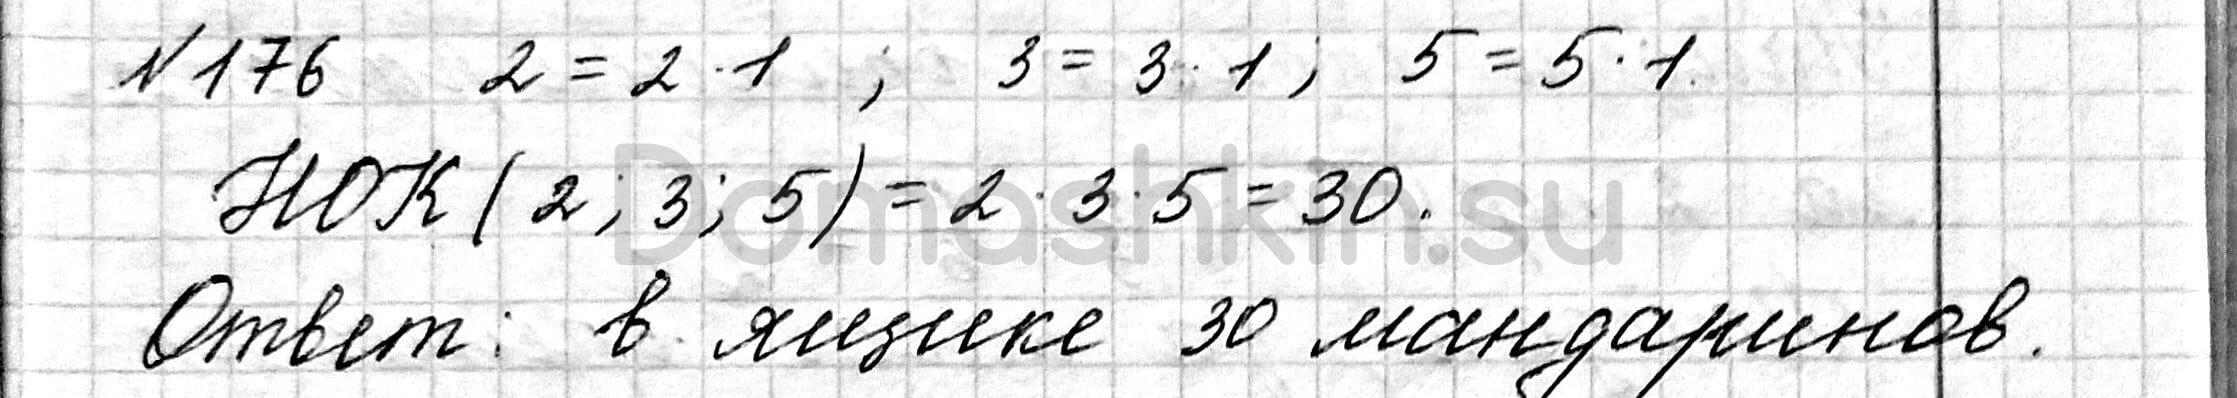 Математика 6 класс учебник Мерзляк номер 176 решение